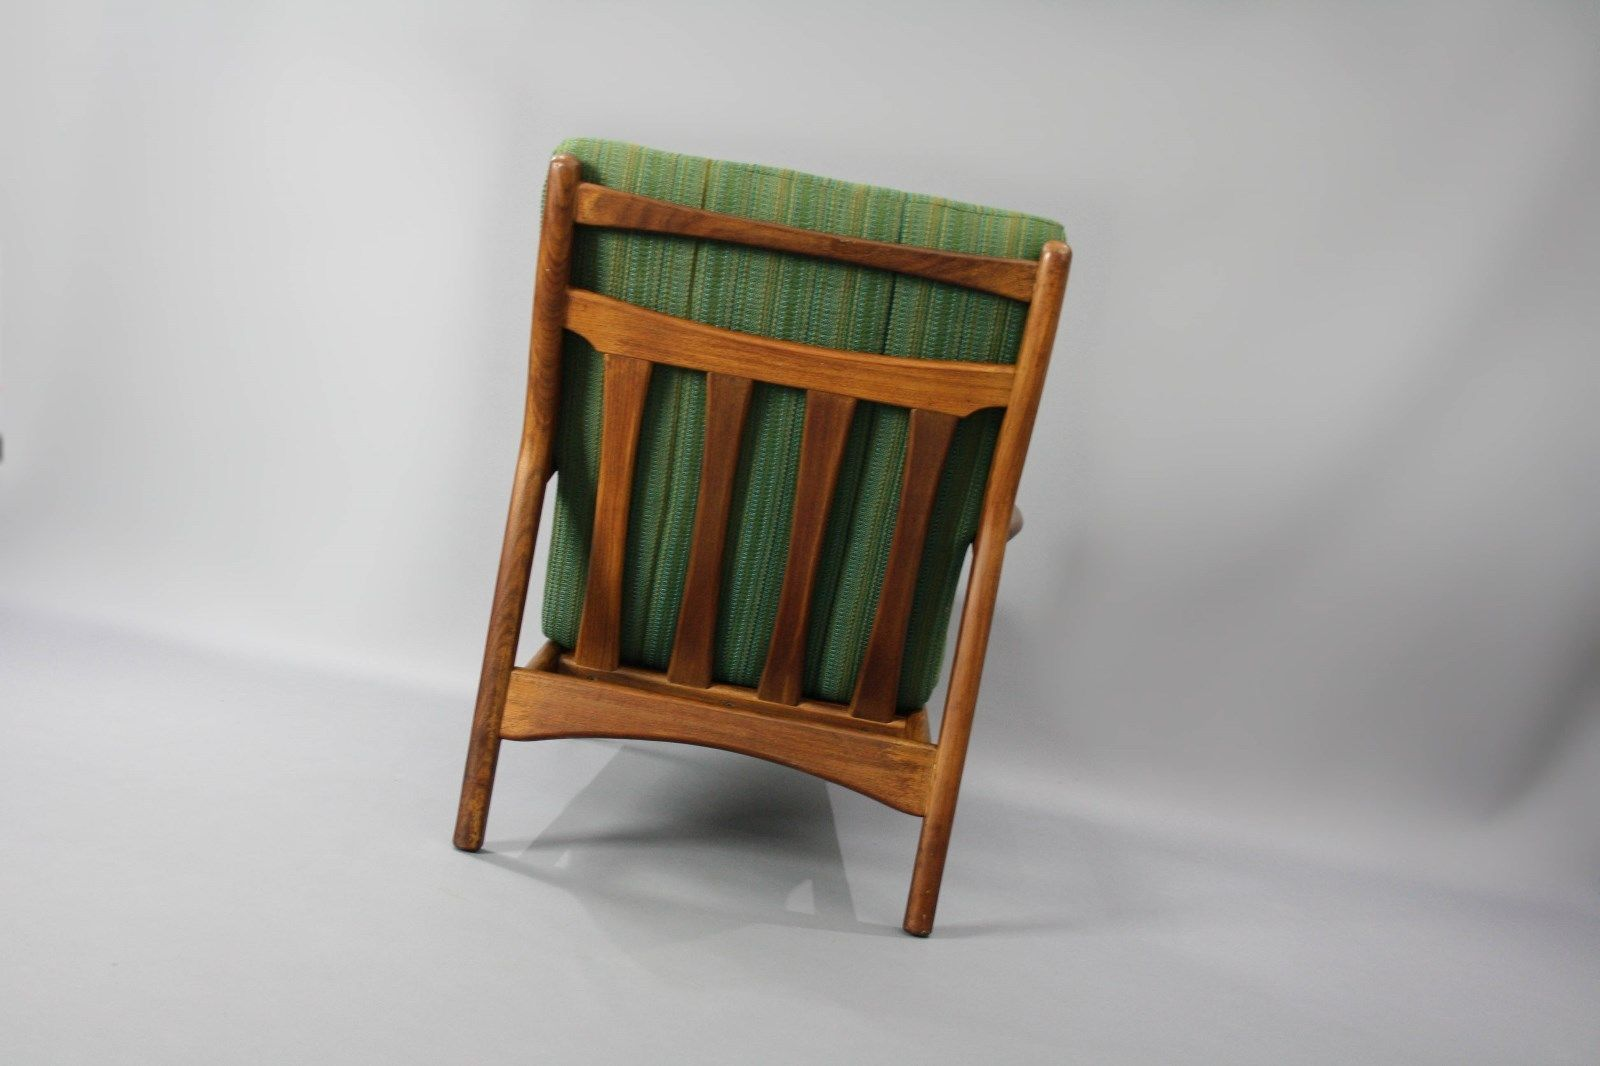 Magnificent Mid Century Toothill Heals Uk Original Teak Armchair Retro Forskolin Free Trial Chair Design Images Forskolin Free Trialorg